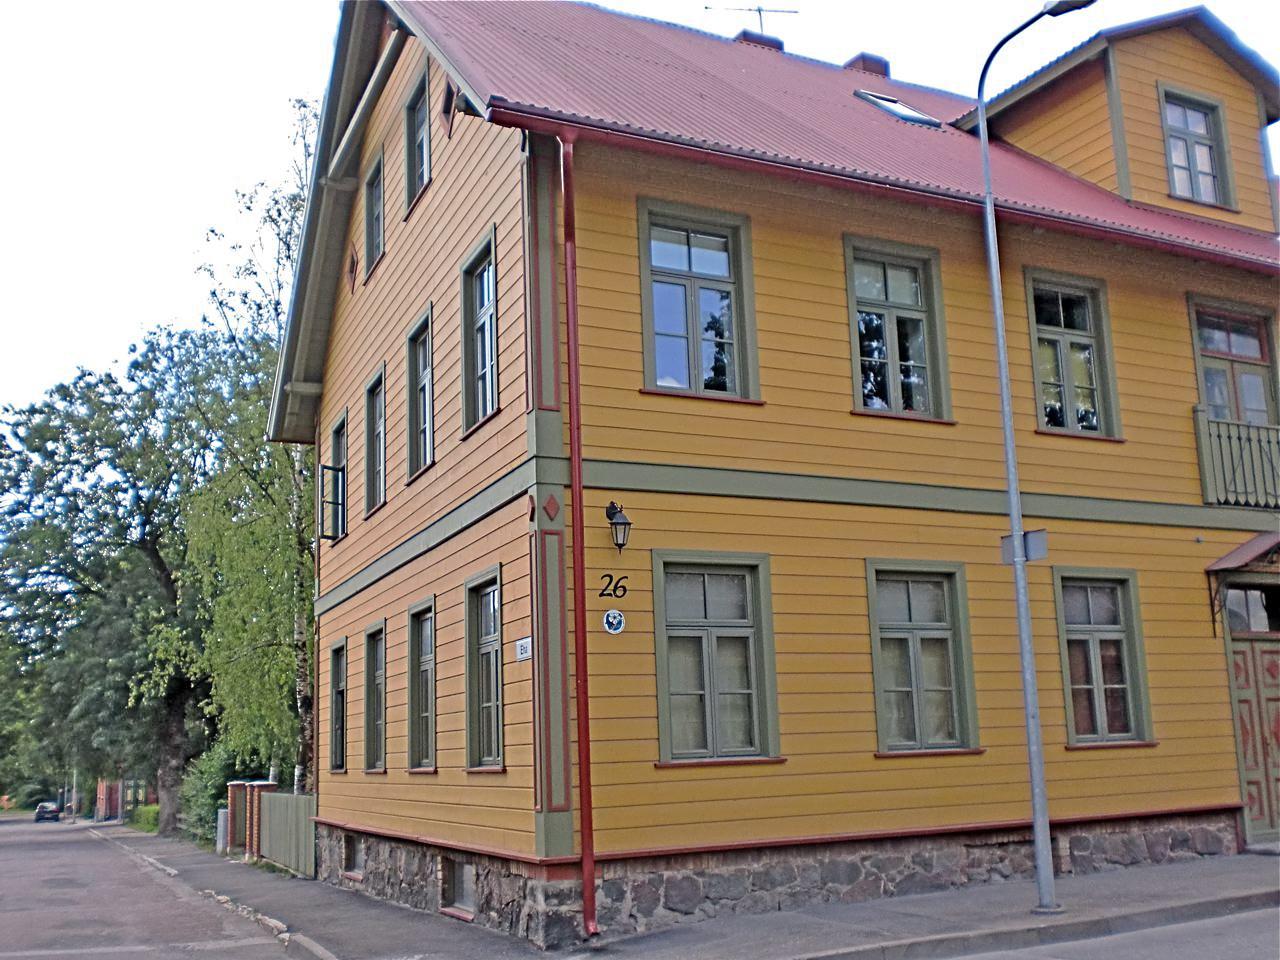 Kleuren oker en groen in Pärnu Estland